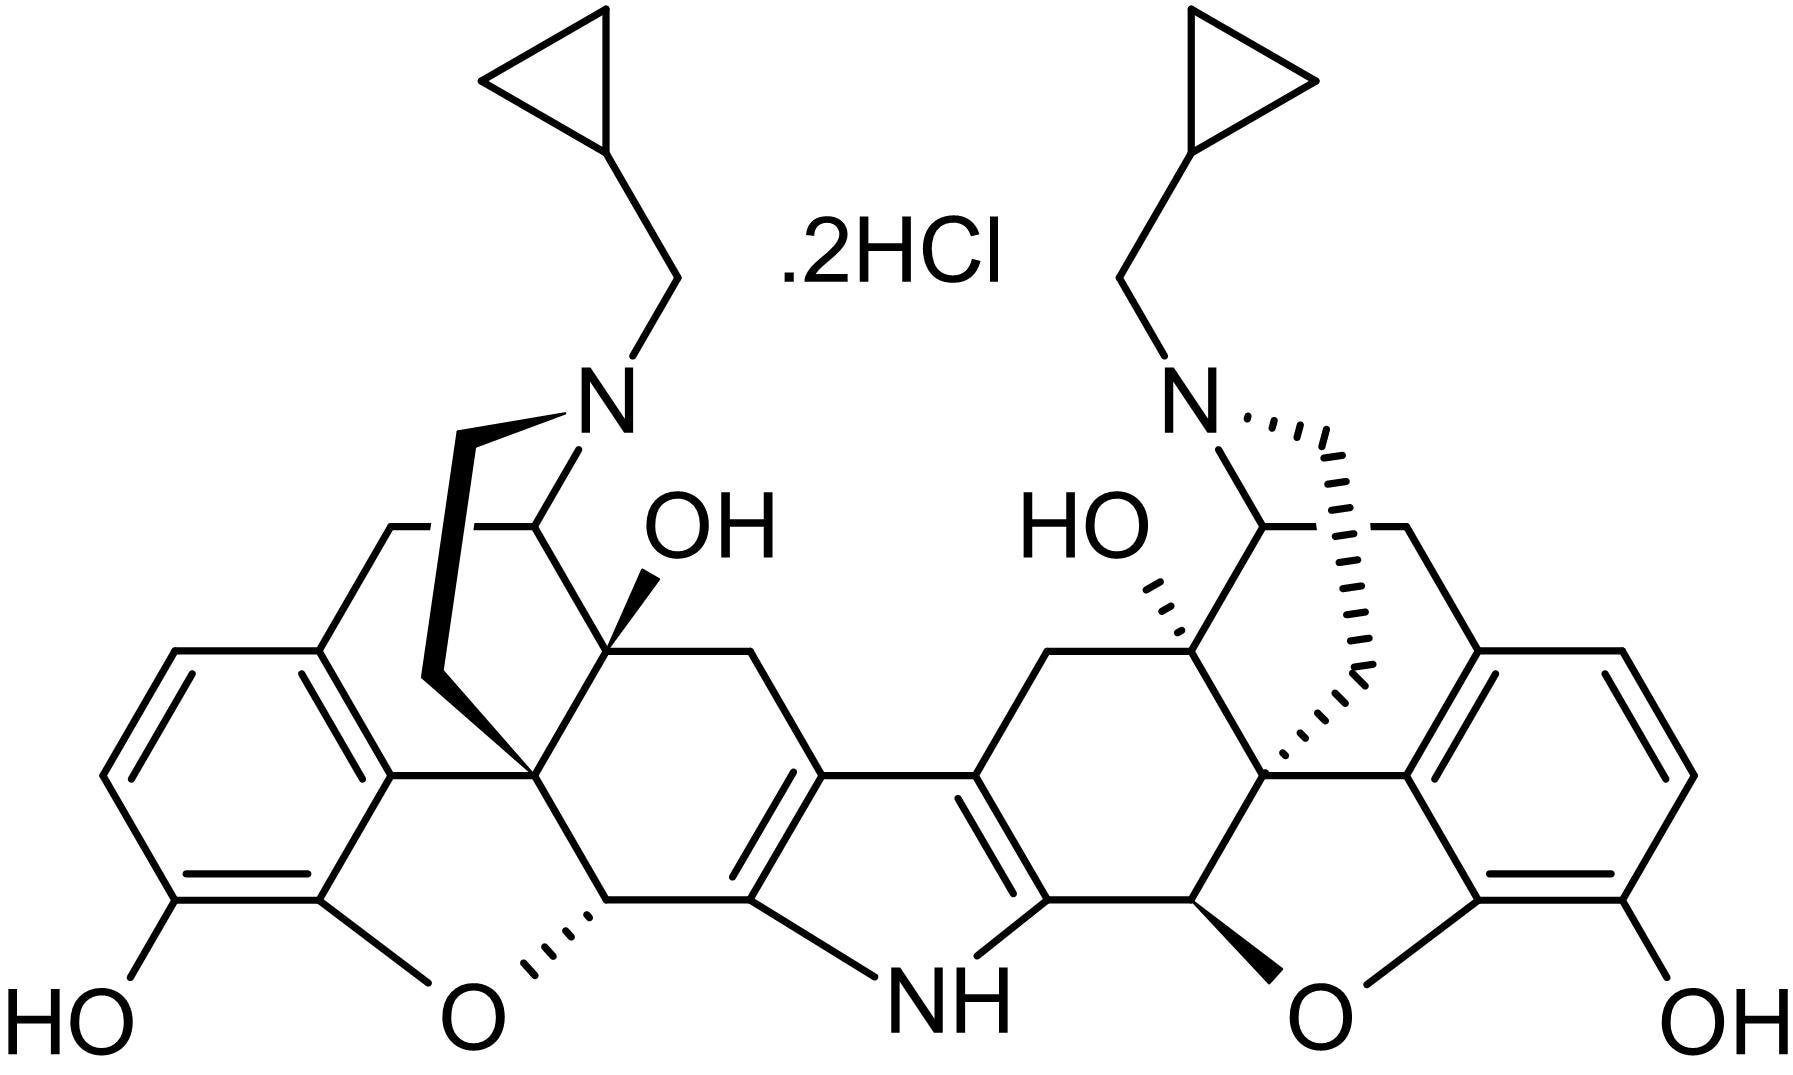 Chemical Structure - nor-Binaltorphimine (nor-BNI), kappa opioid receptor antagonist (ab120078)